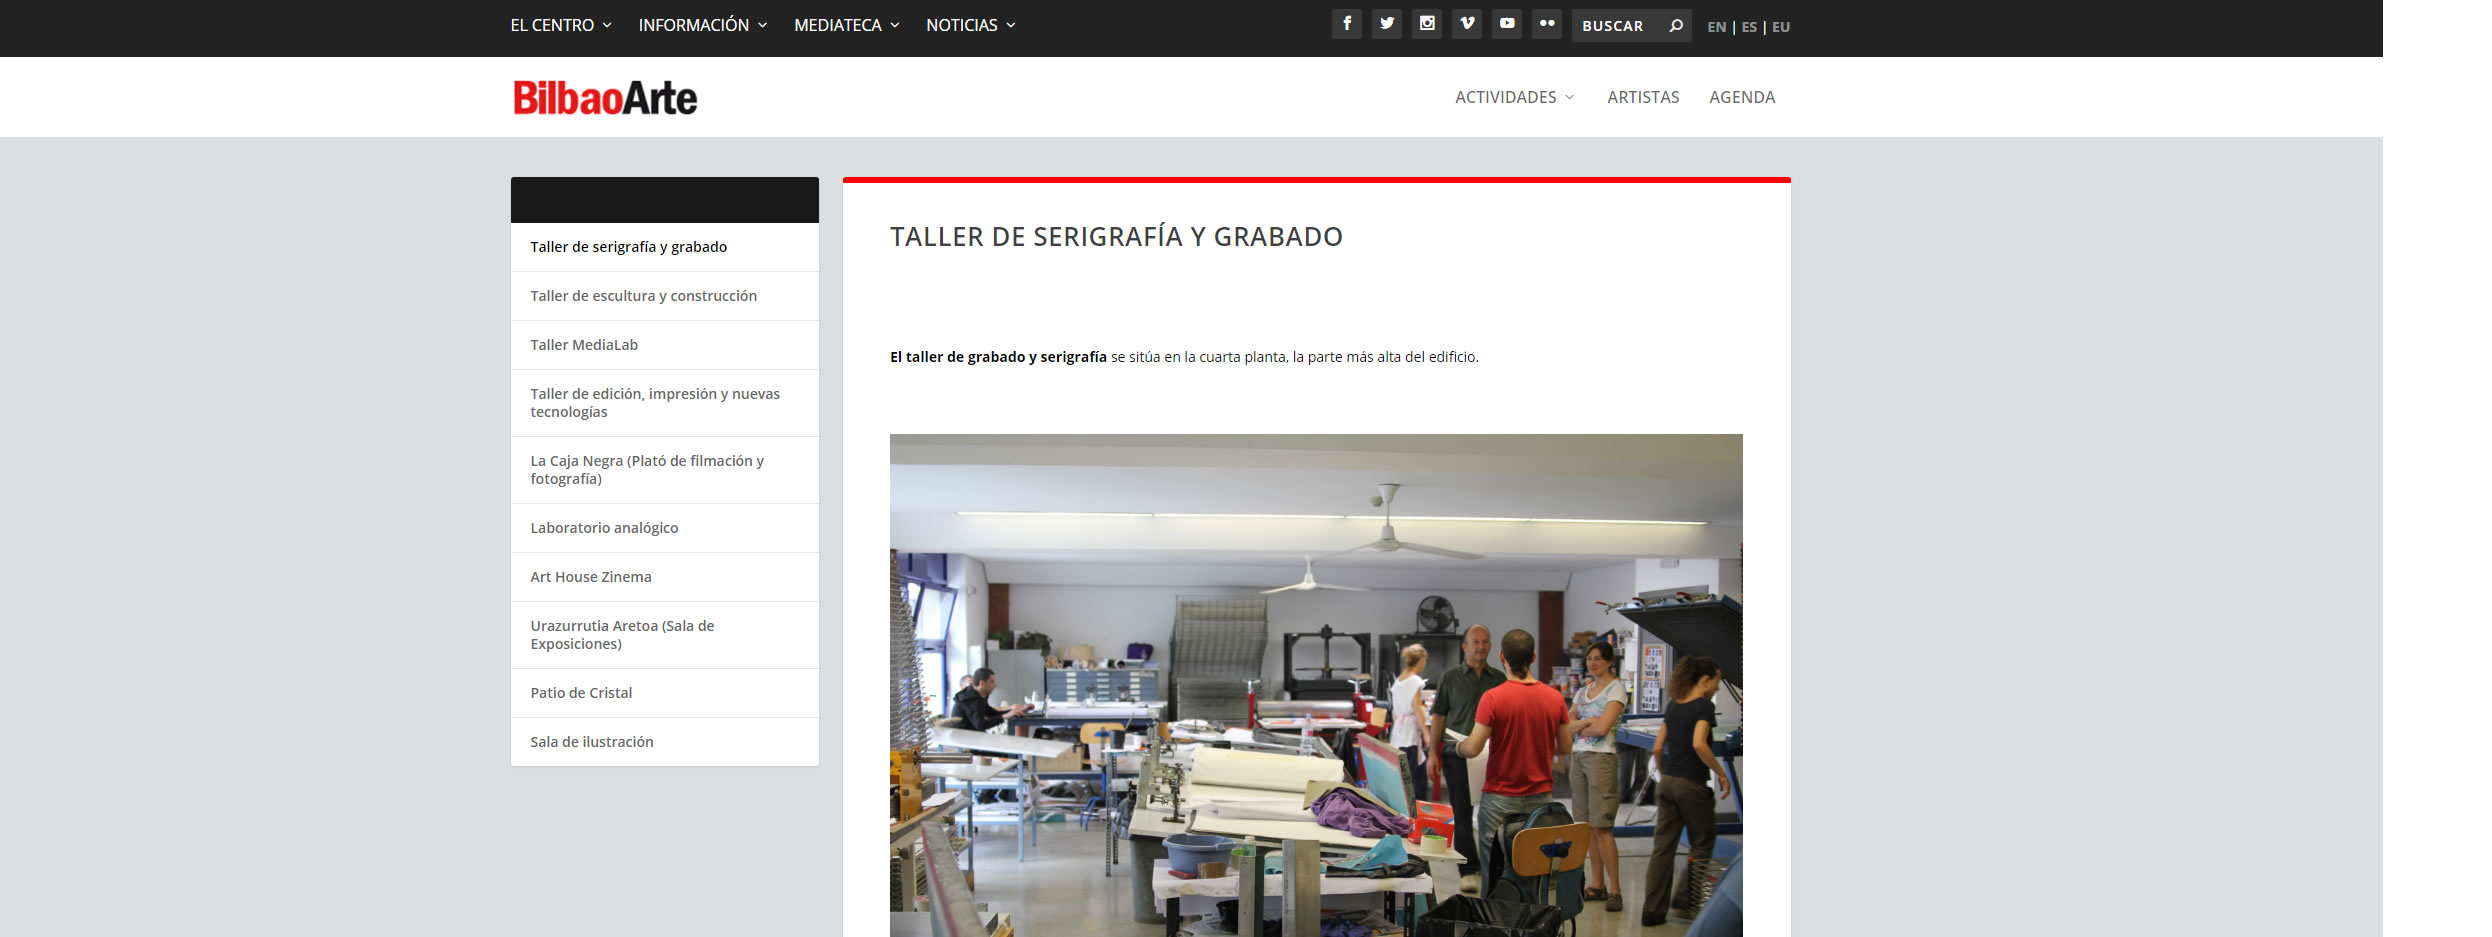 bilbaoarte+galeria_de_gravura